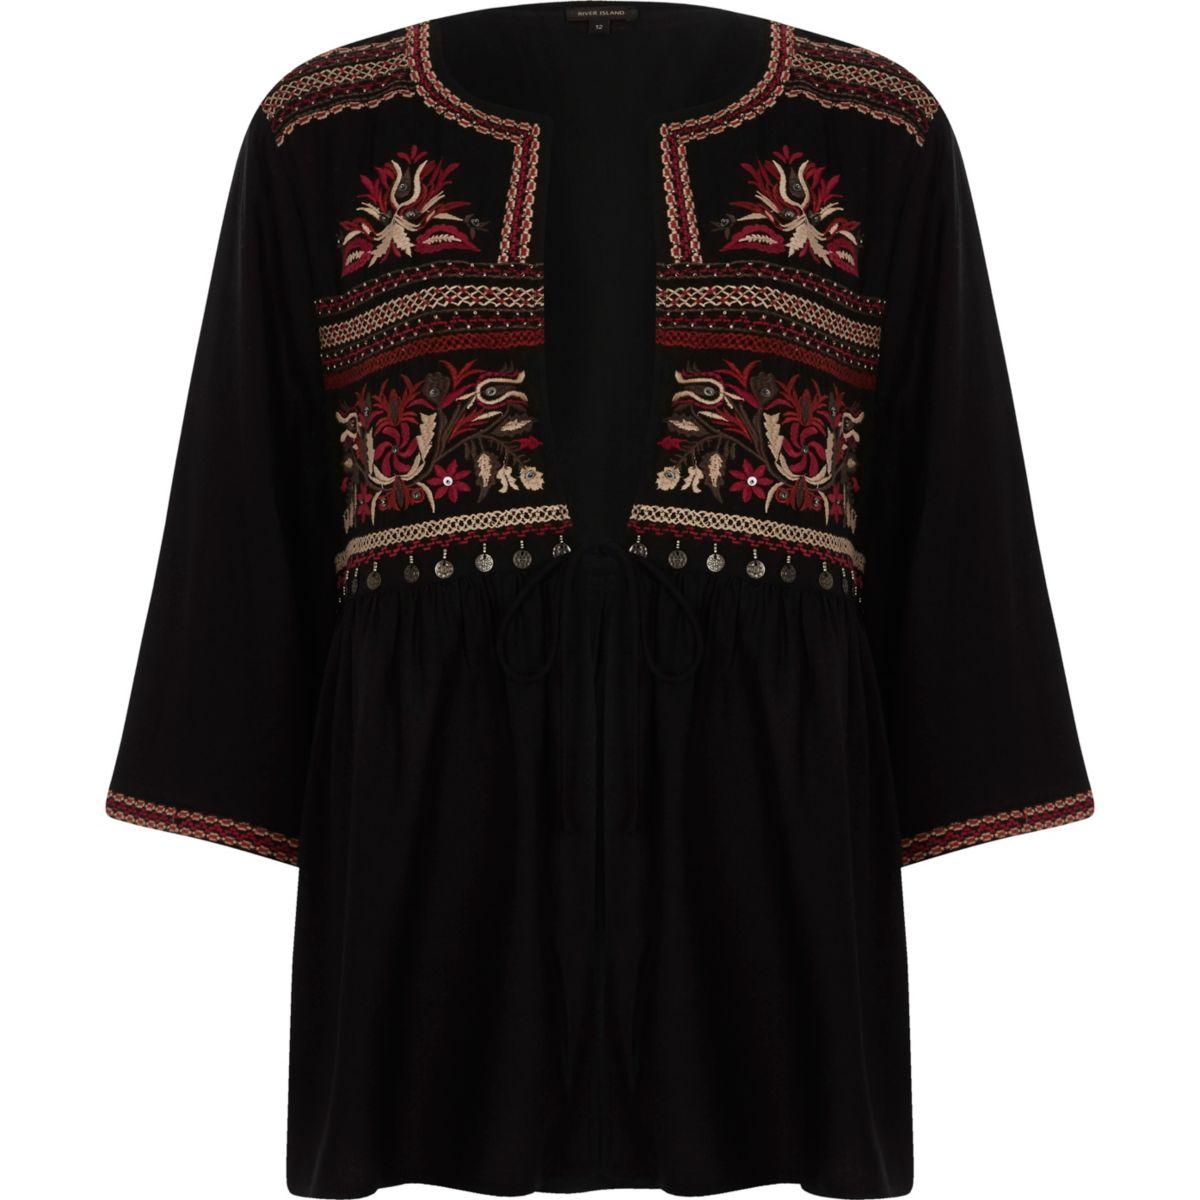 Black embroidered tie up kimono top